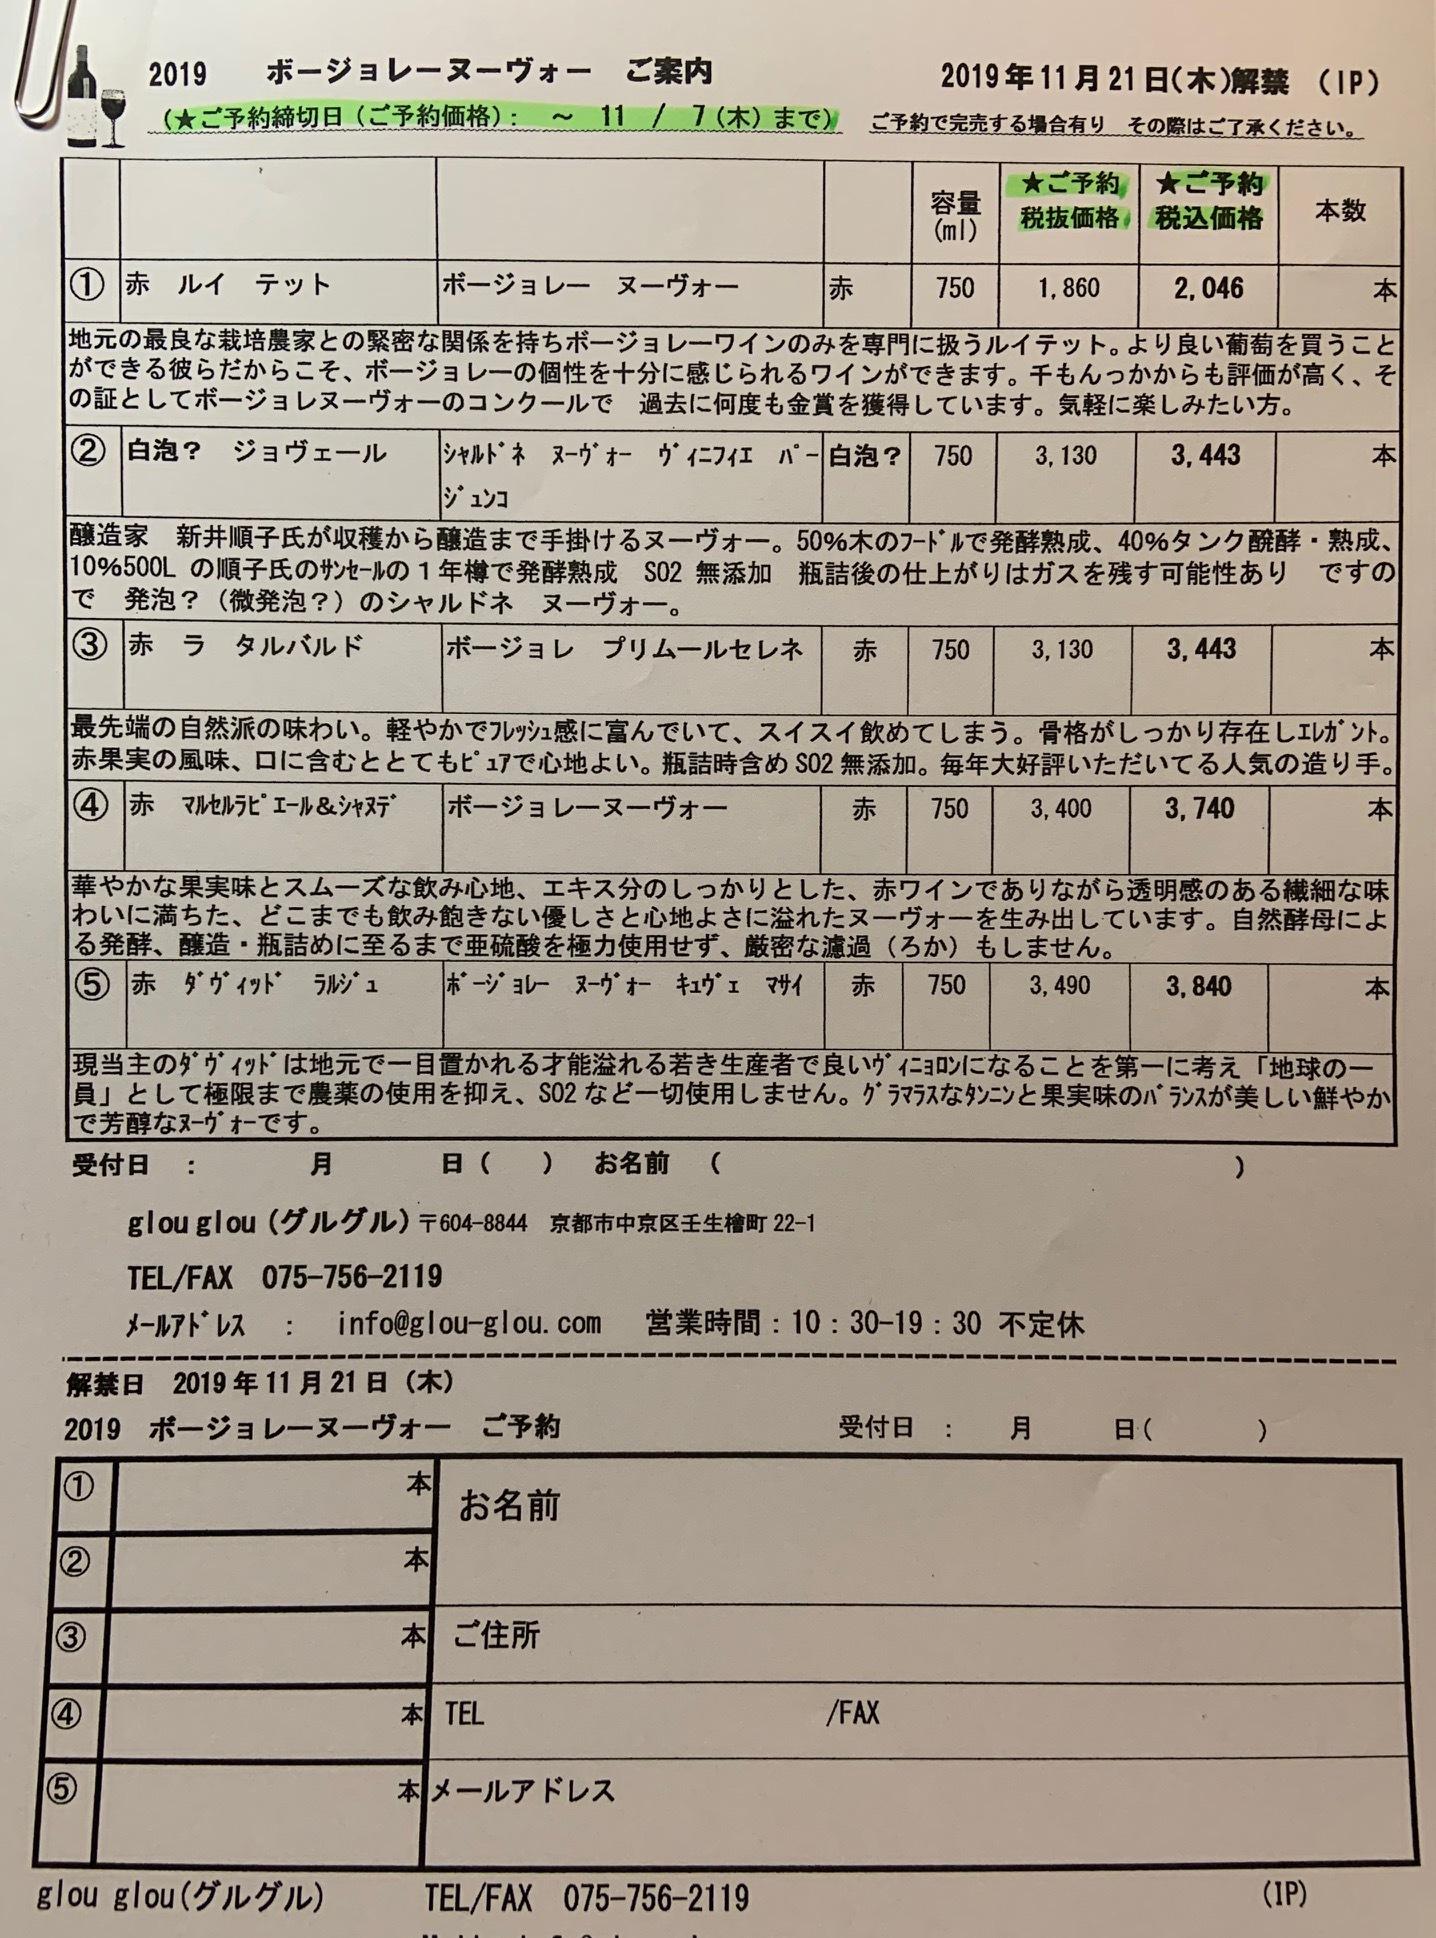 2019VT ボージョレーヌーヴォー ご予約受付(IP)